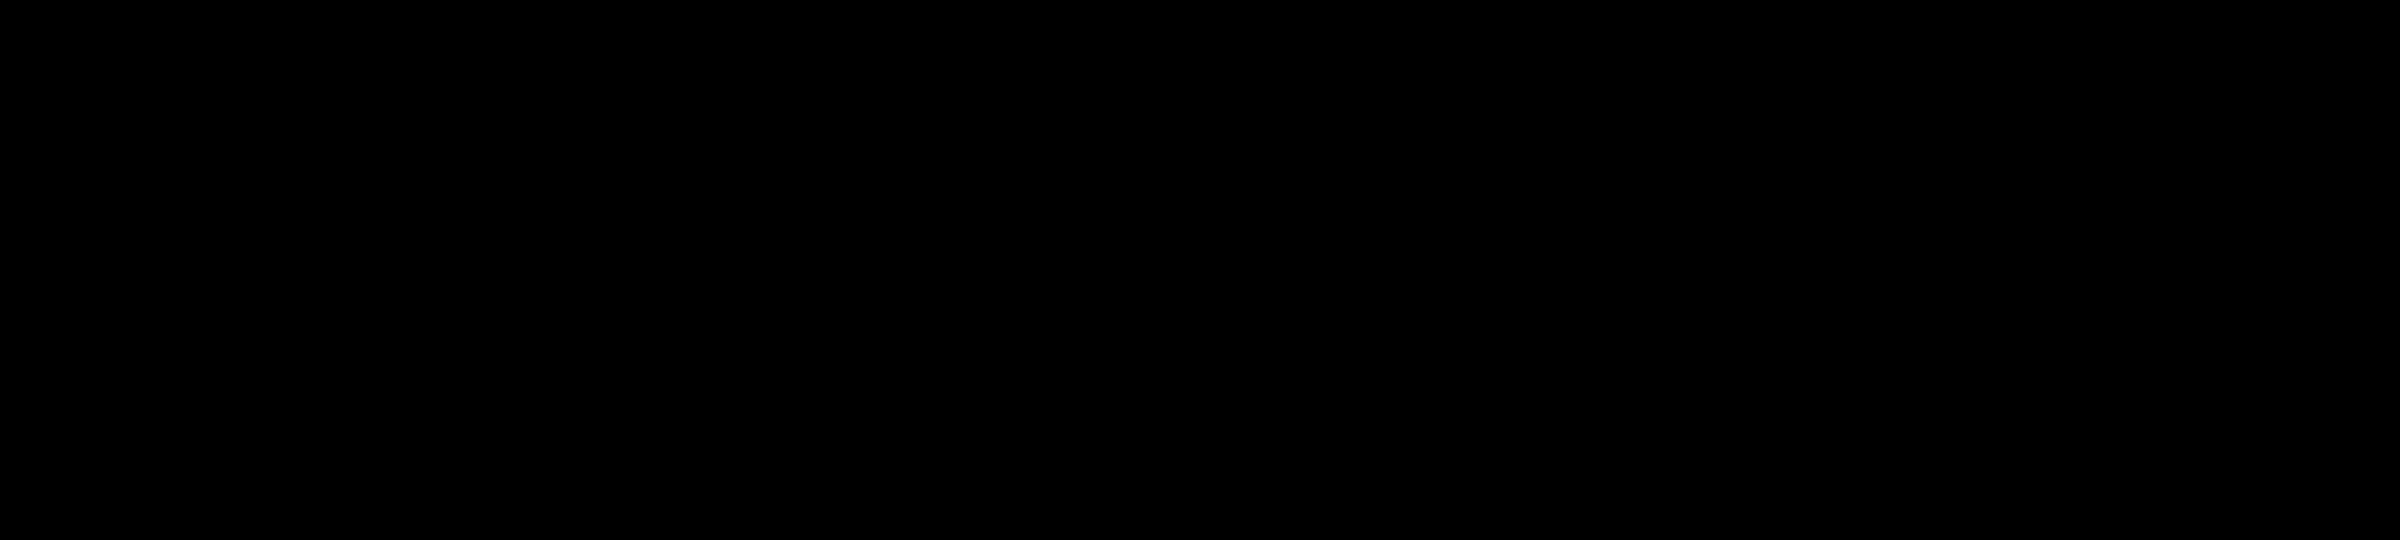 The Walking Dead Logo PNG Transparent & SVG Vector.